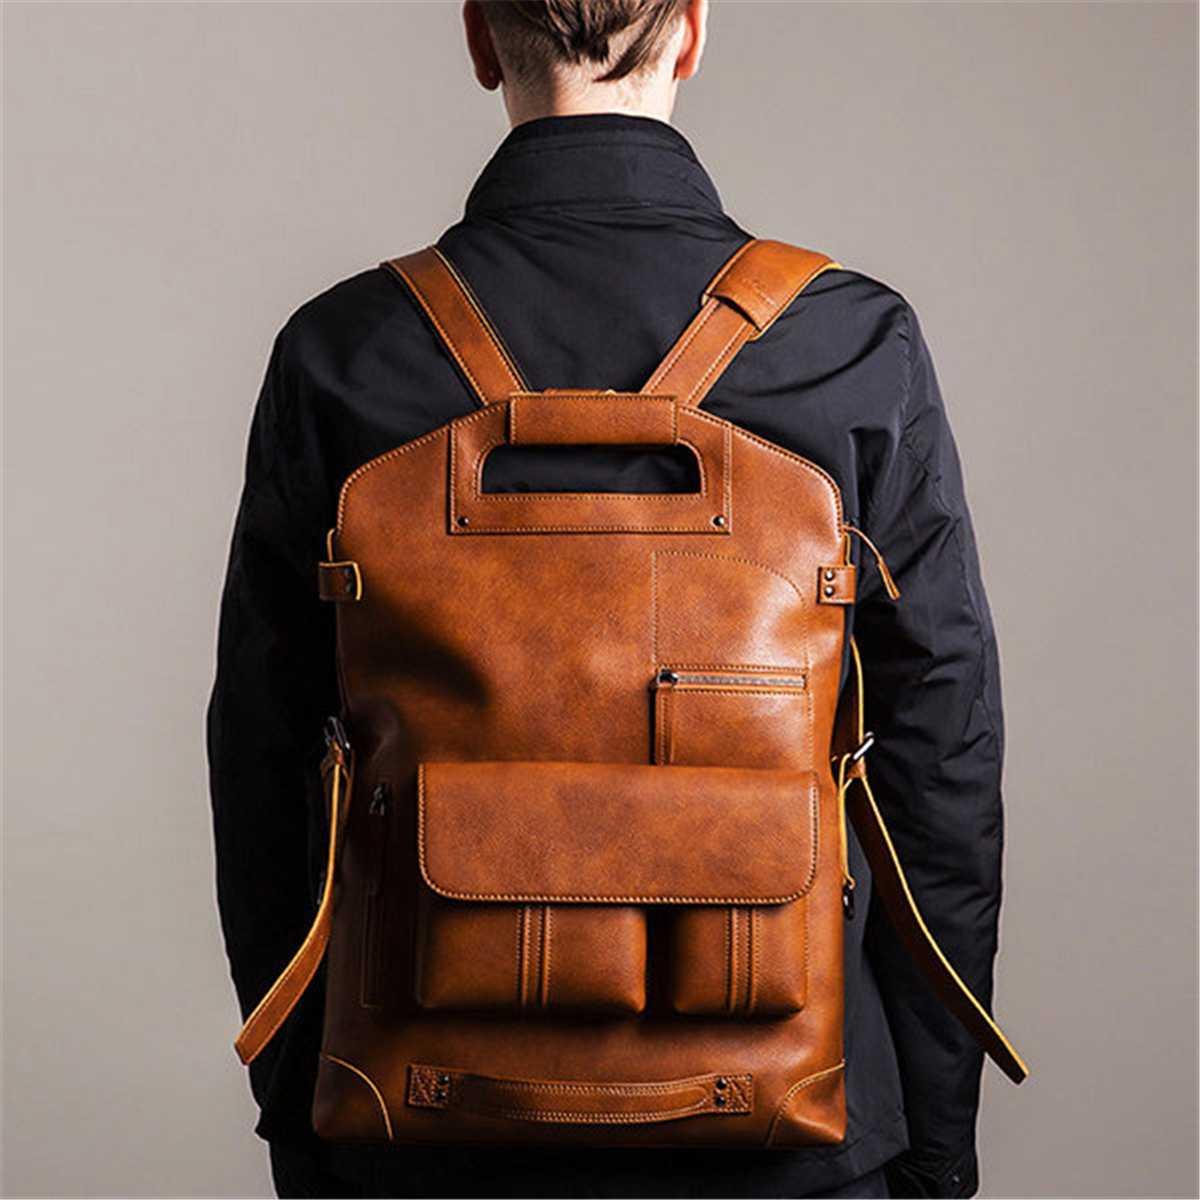 Foldable Genuine Leather Men Backpacks New Fashion Multifunction Men Solid Handbag Luxury Brand Large Computer Laptop Bag